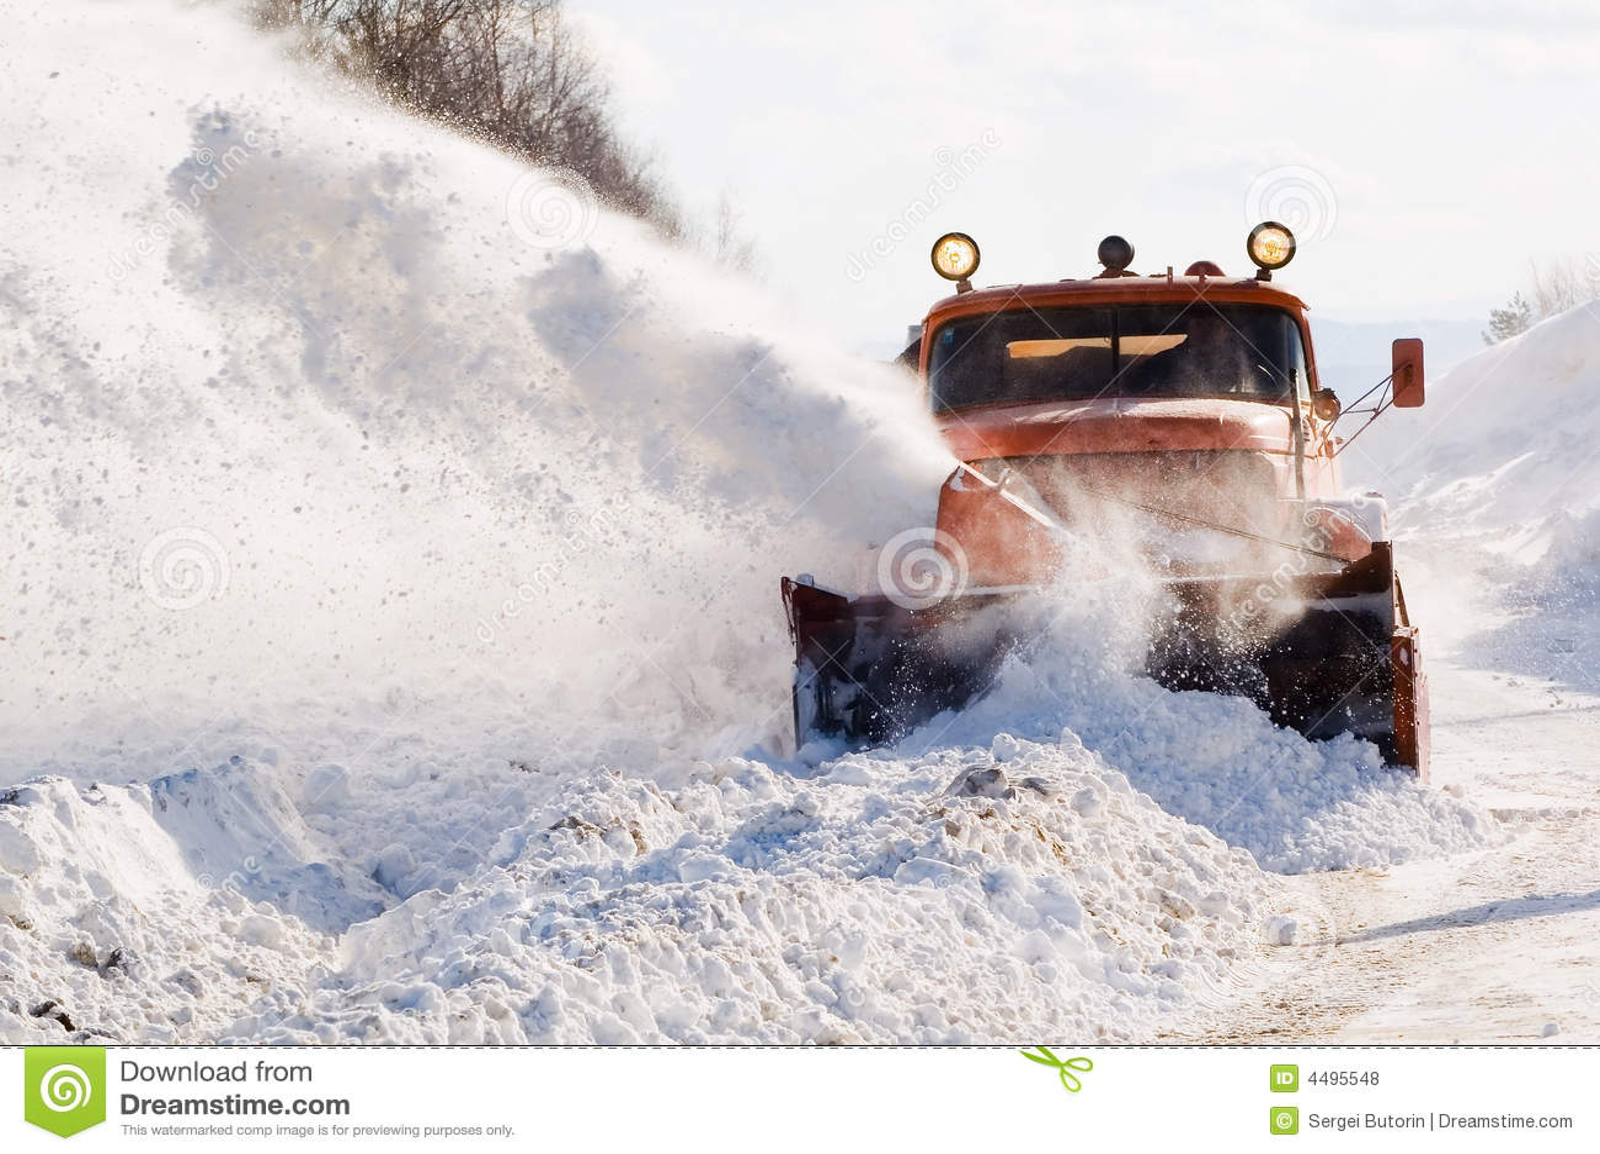 Snowplow at work